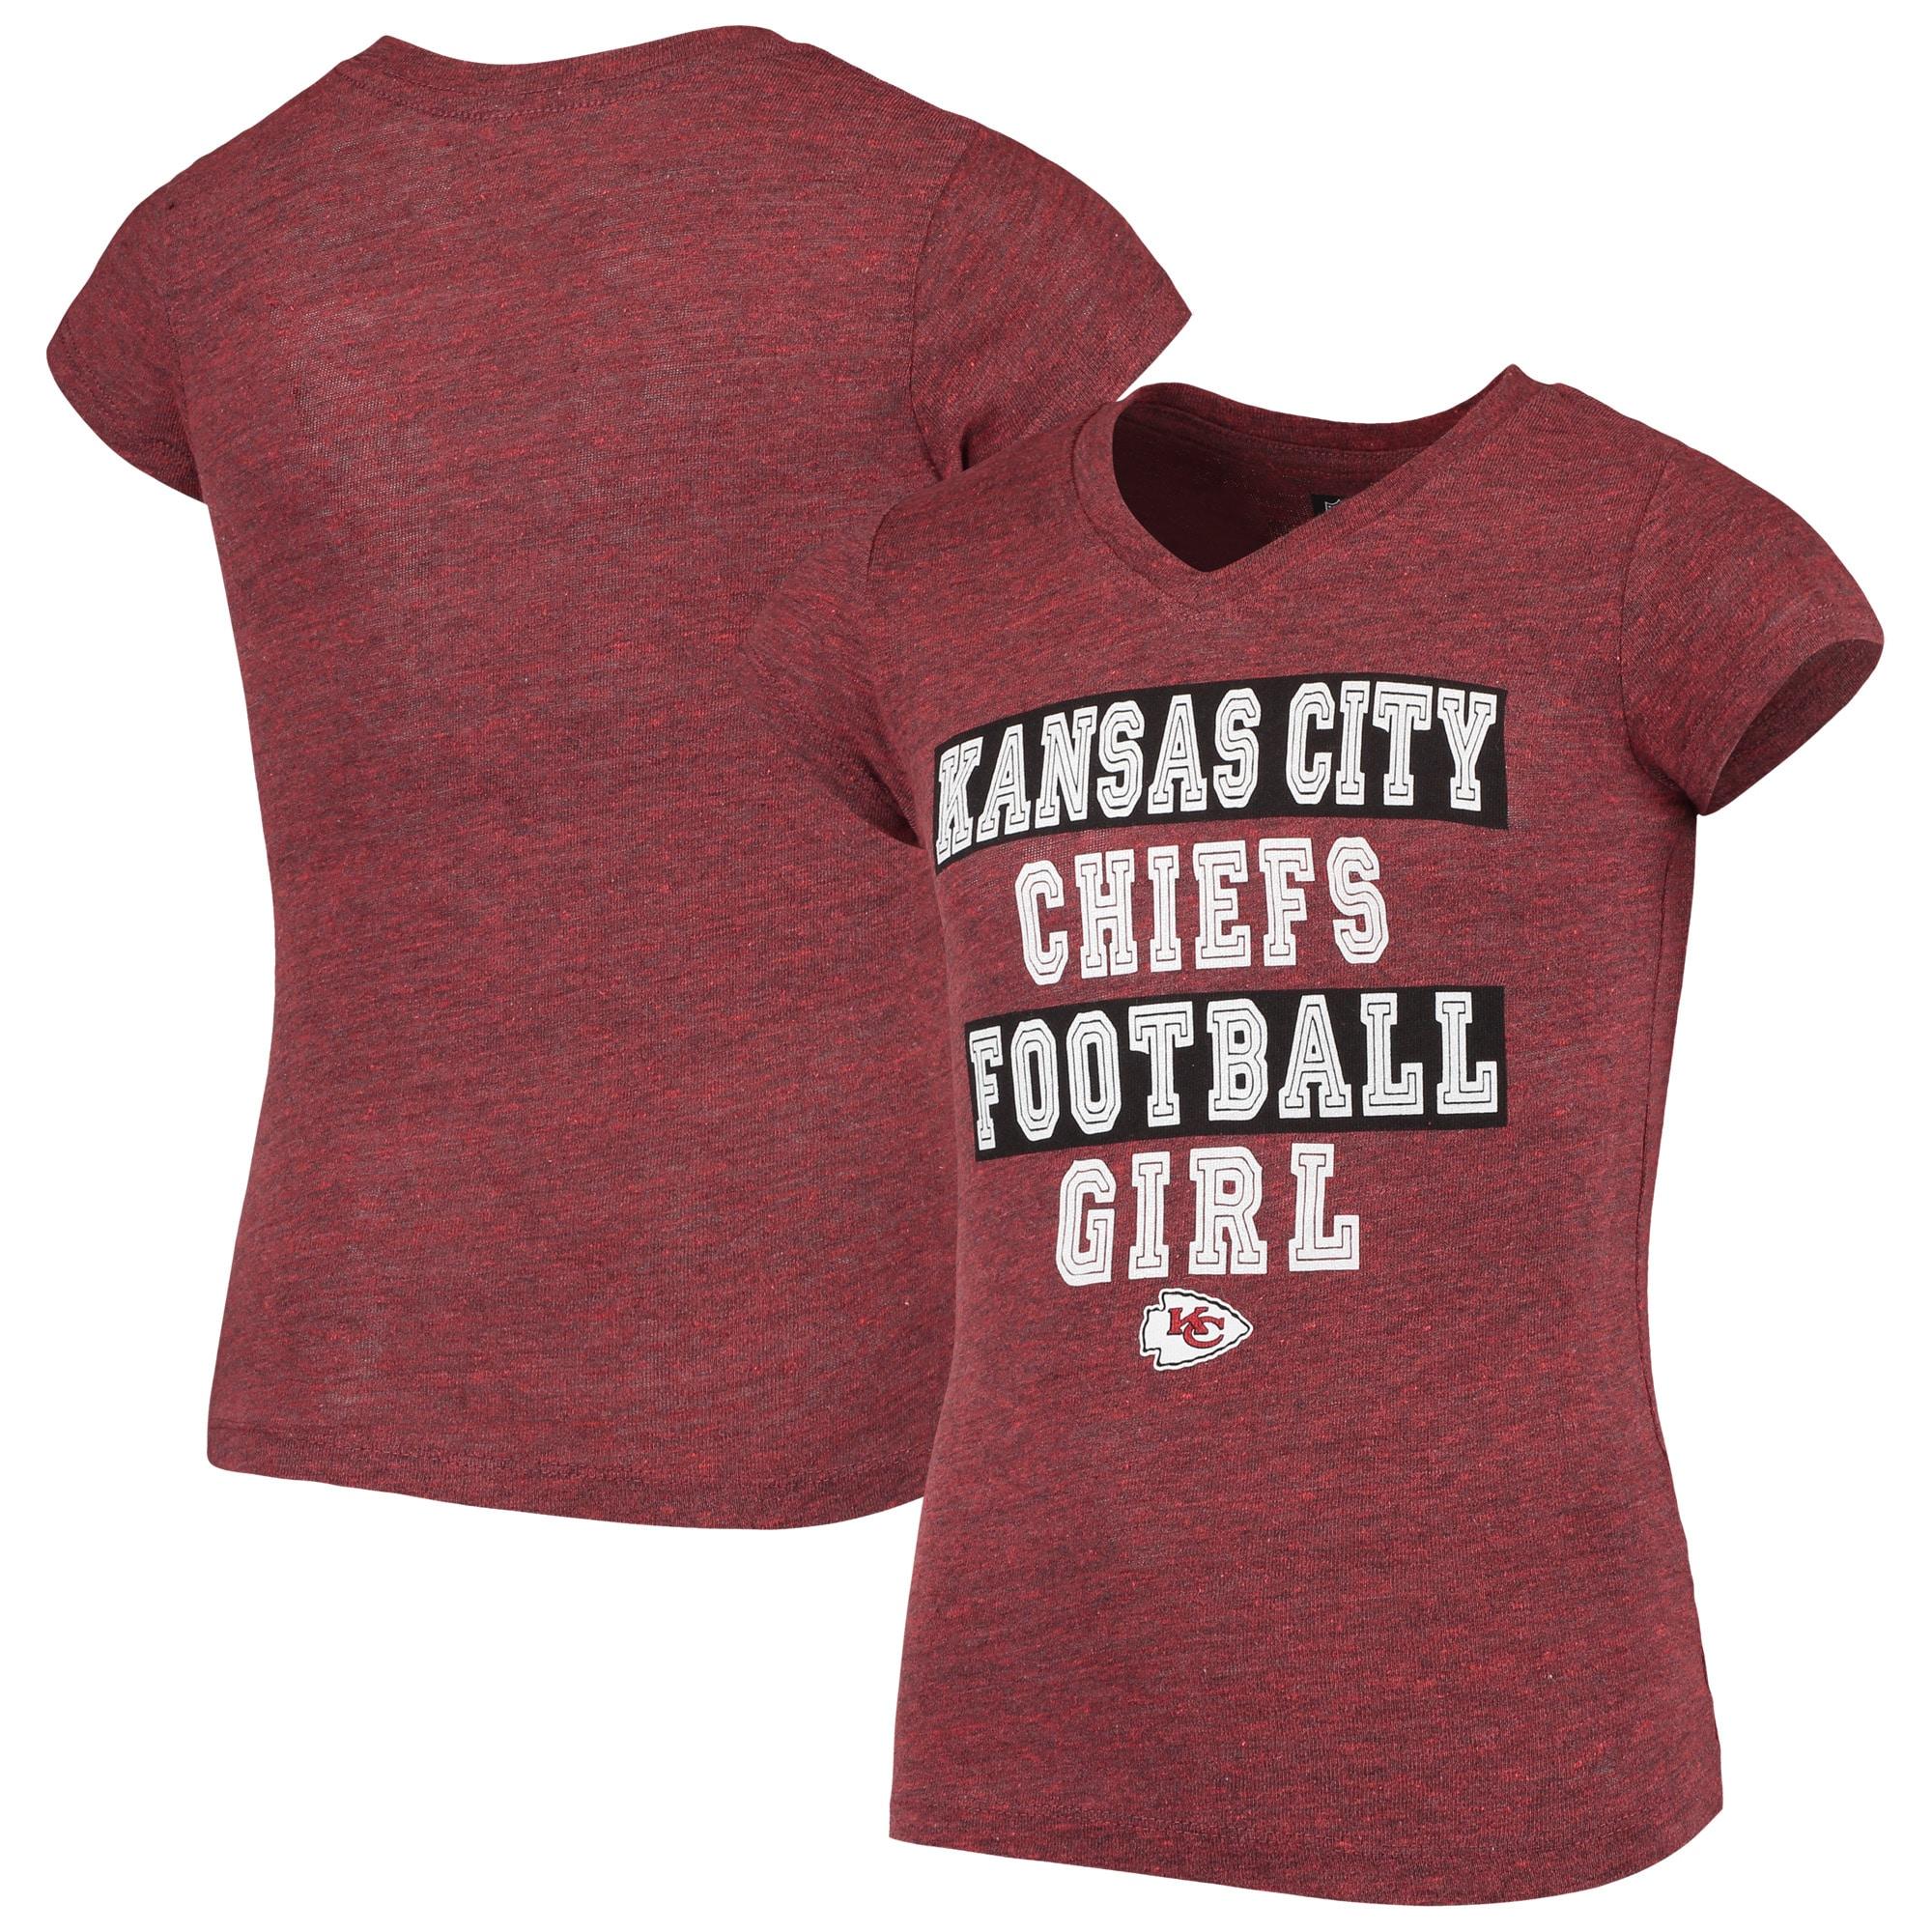 Kansas City Chiefs 5th & Ocean by New Era Girls Youth Football Girl Tri-Blend V-Neck T-Shirt - Red